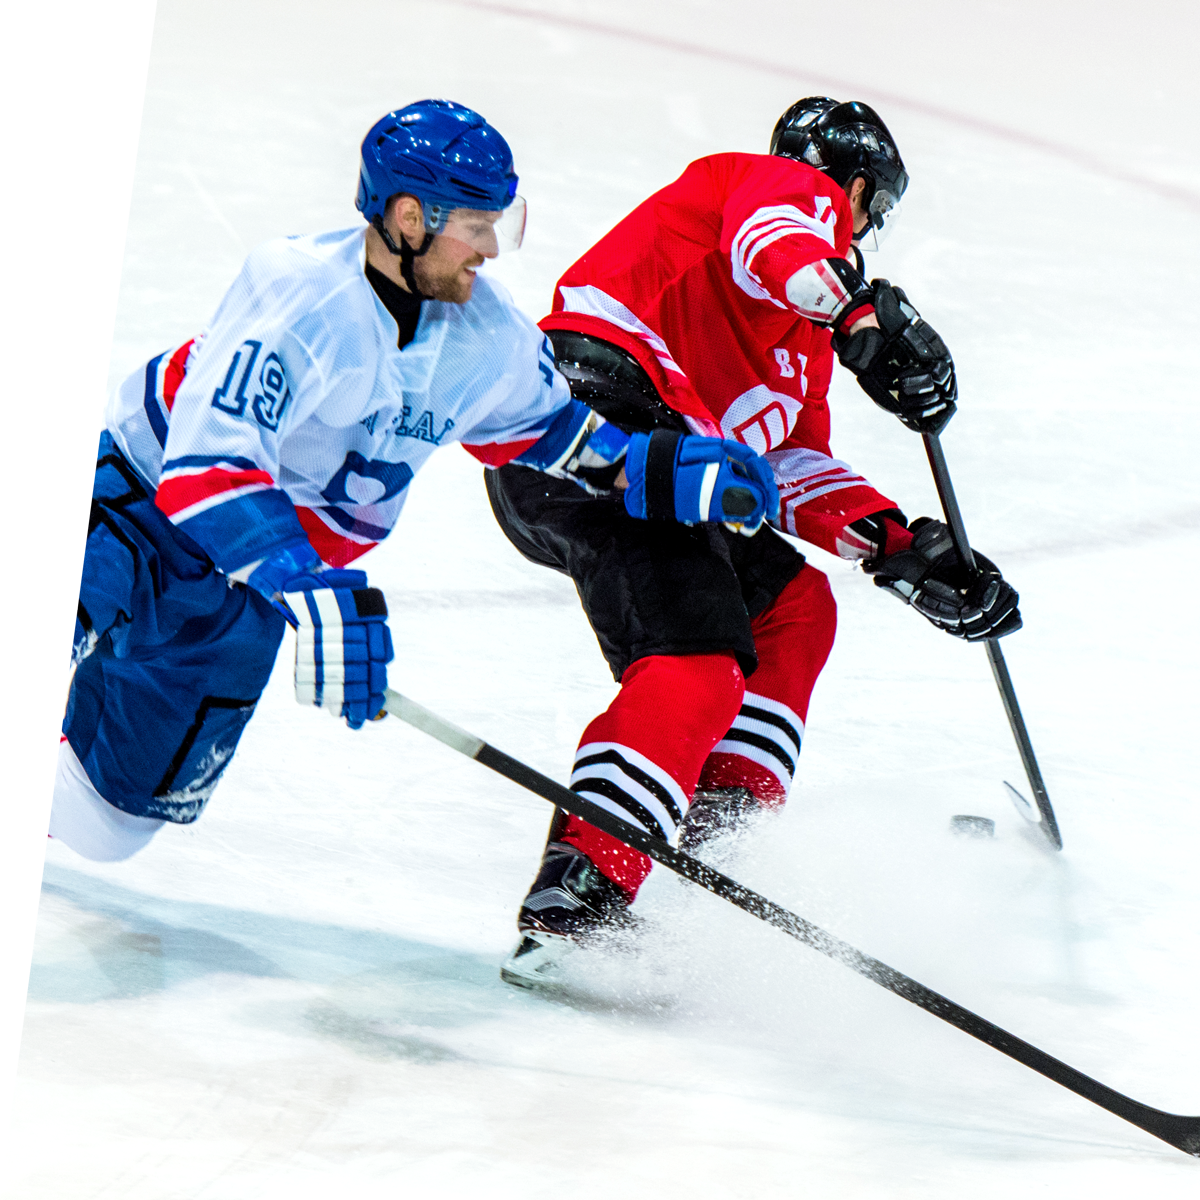 Männer spielen ice hockey